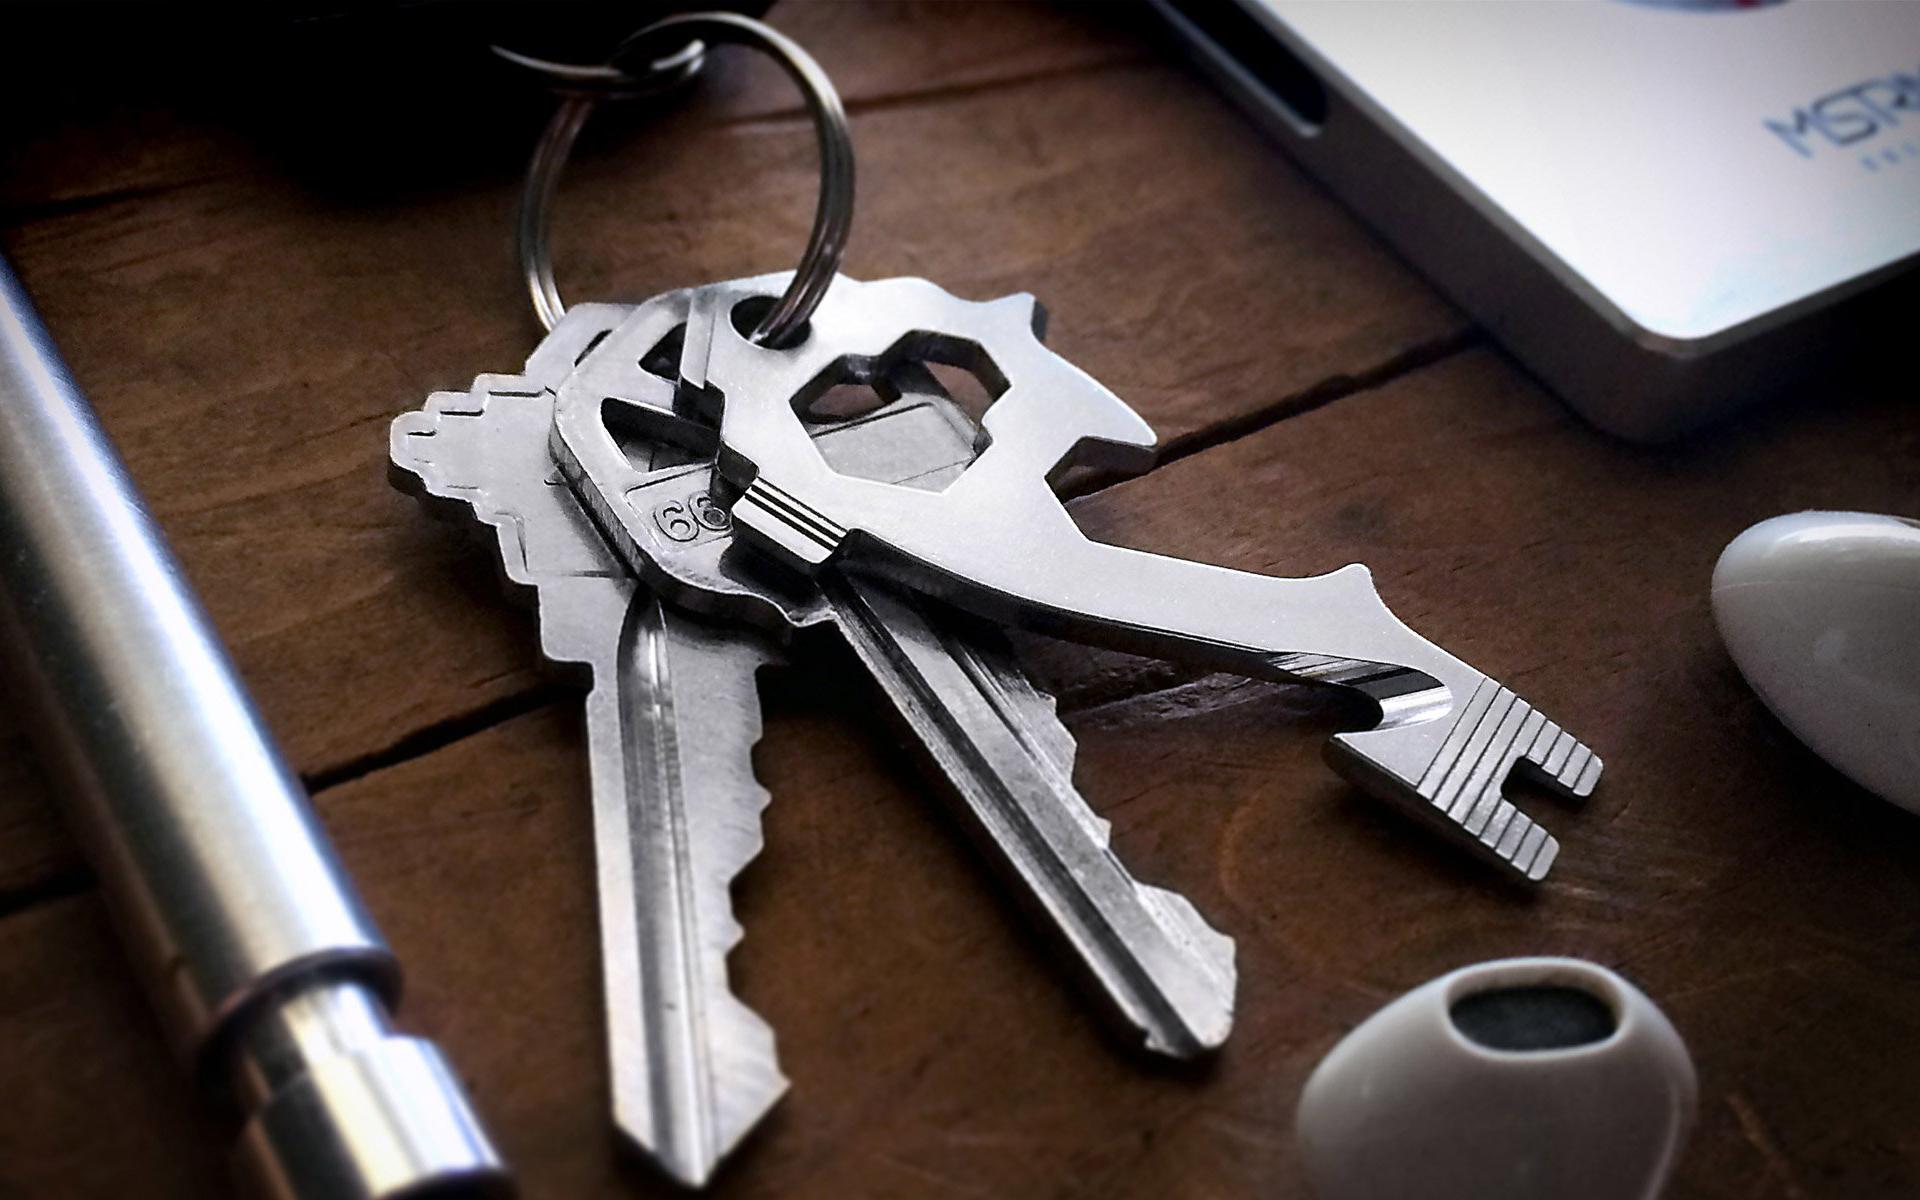 The MSTR Key